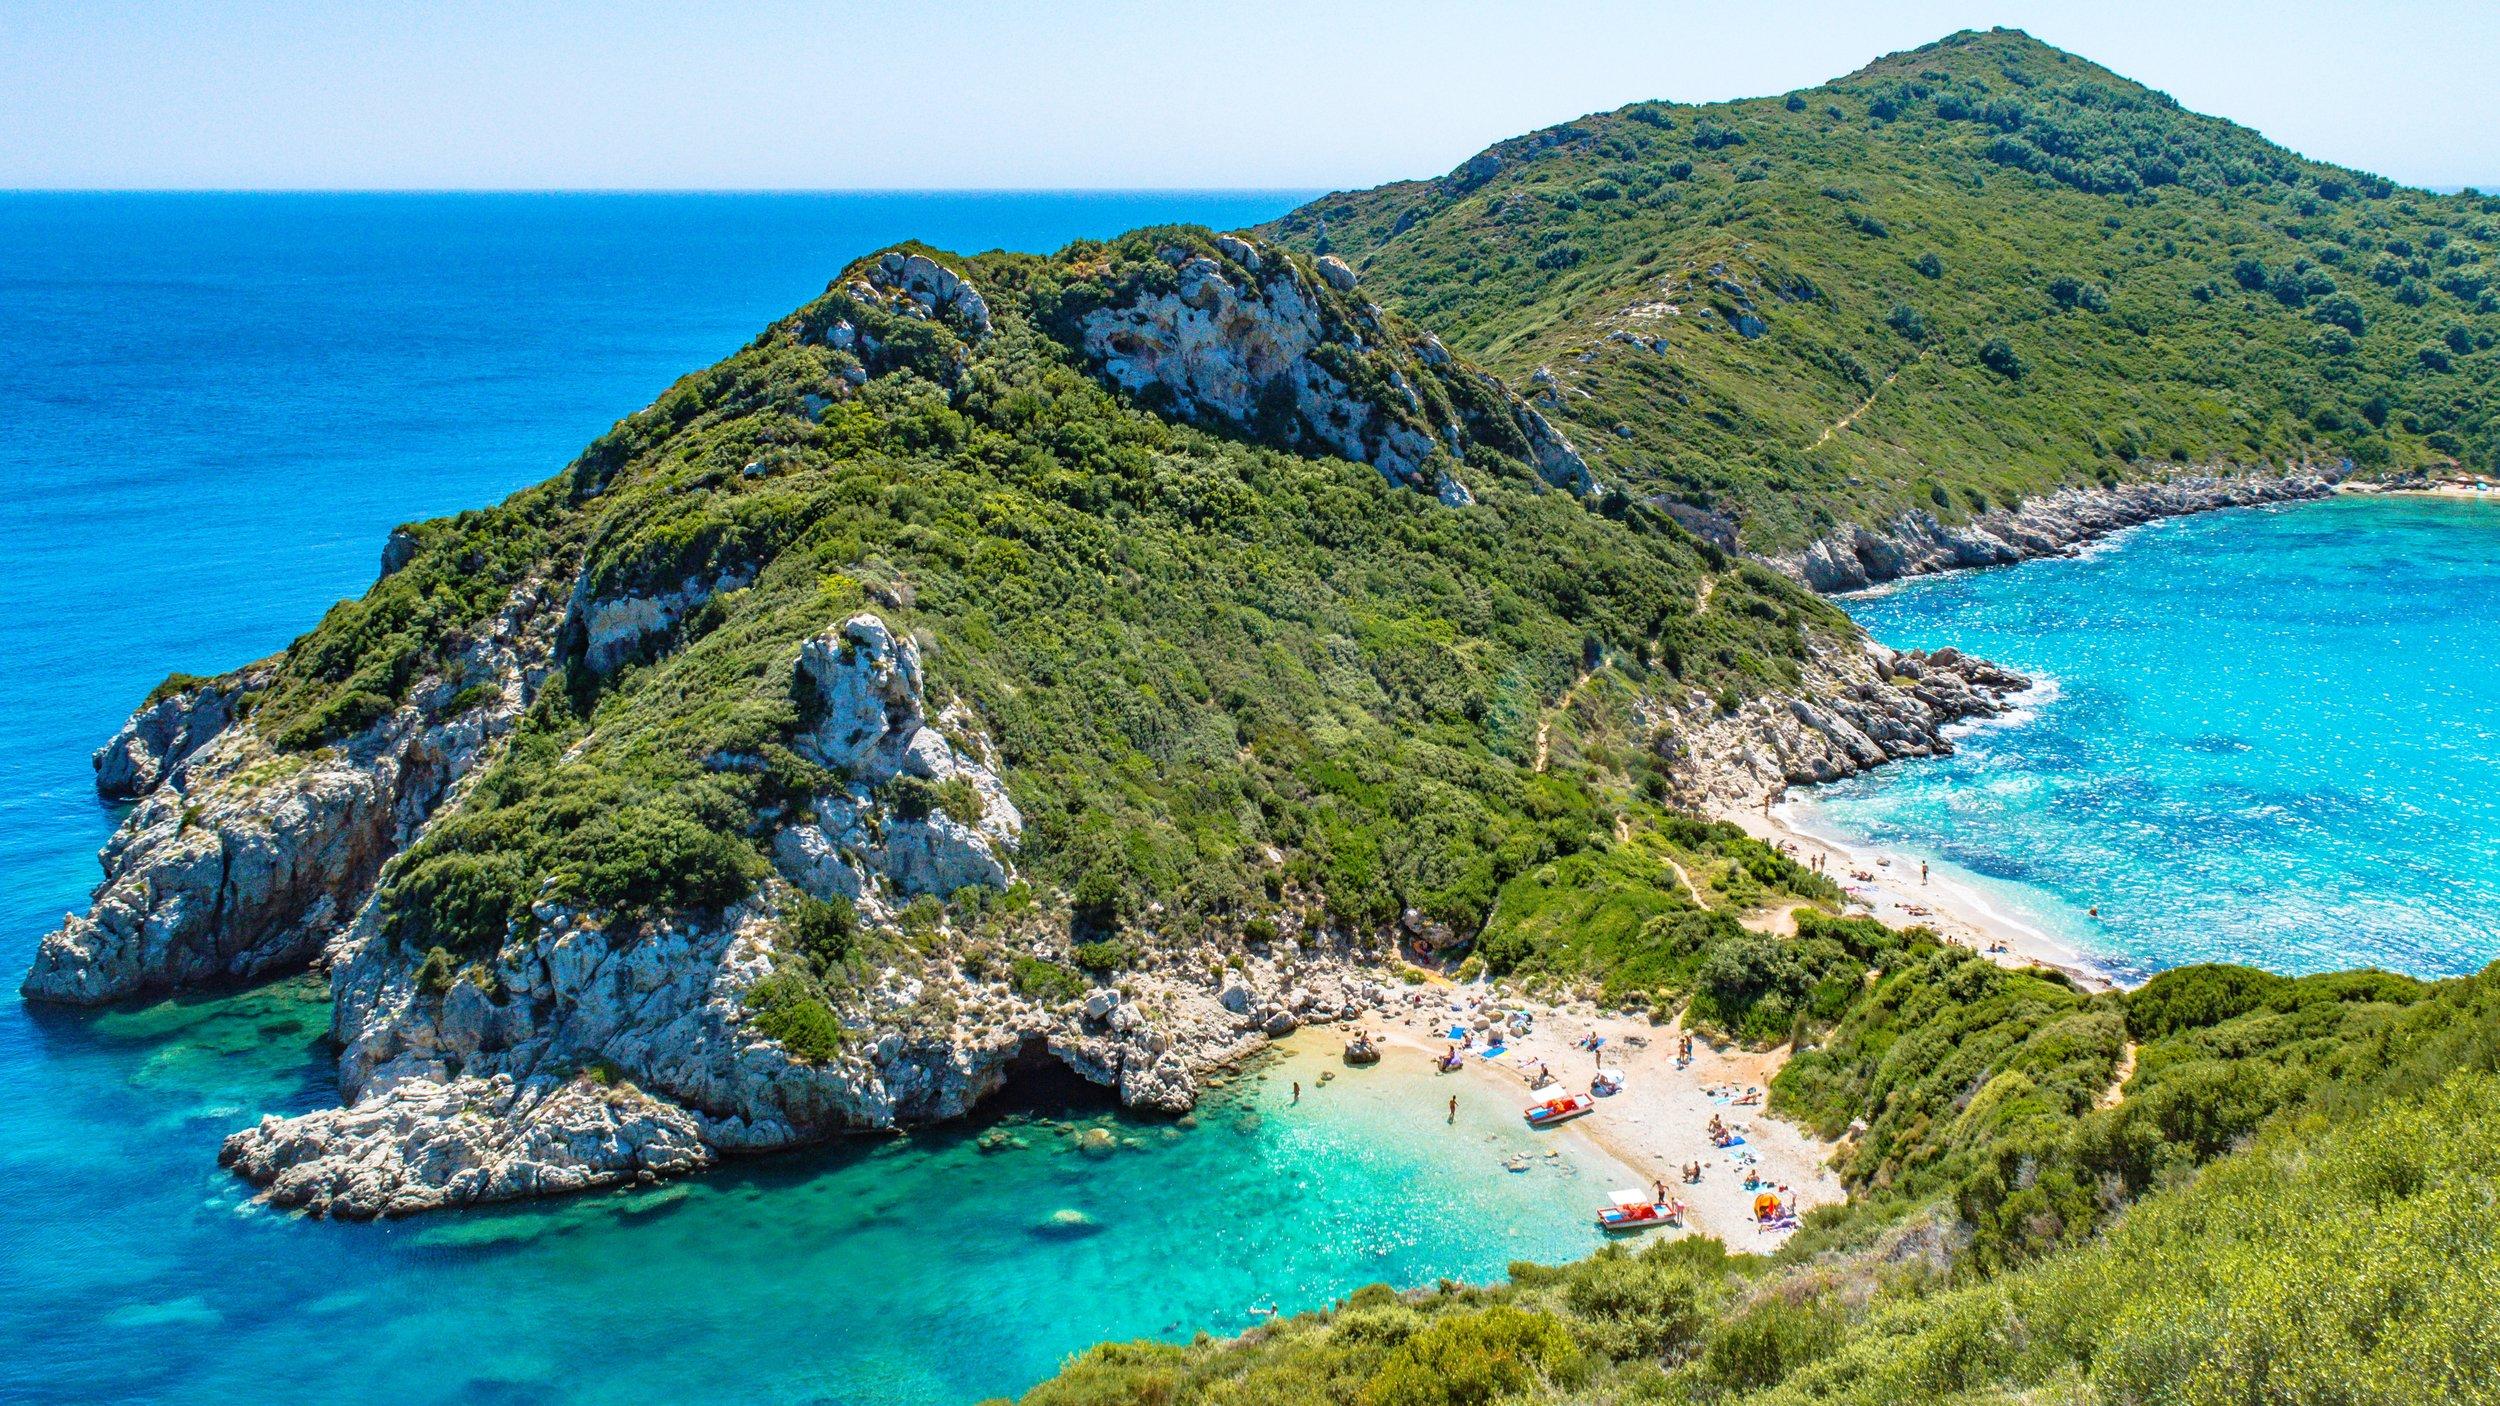 Ionian Islands, Photo by Chris Karidis via Unsplash